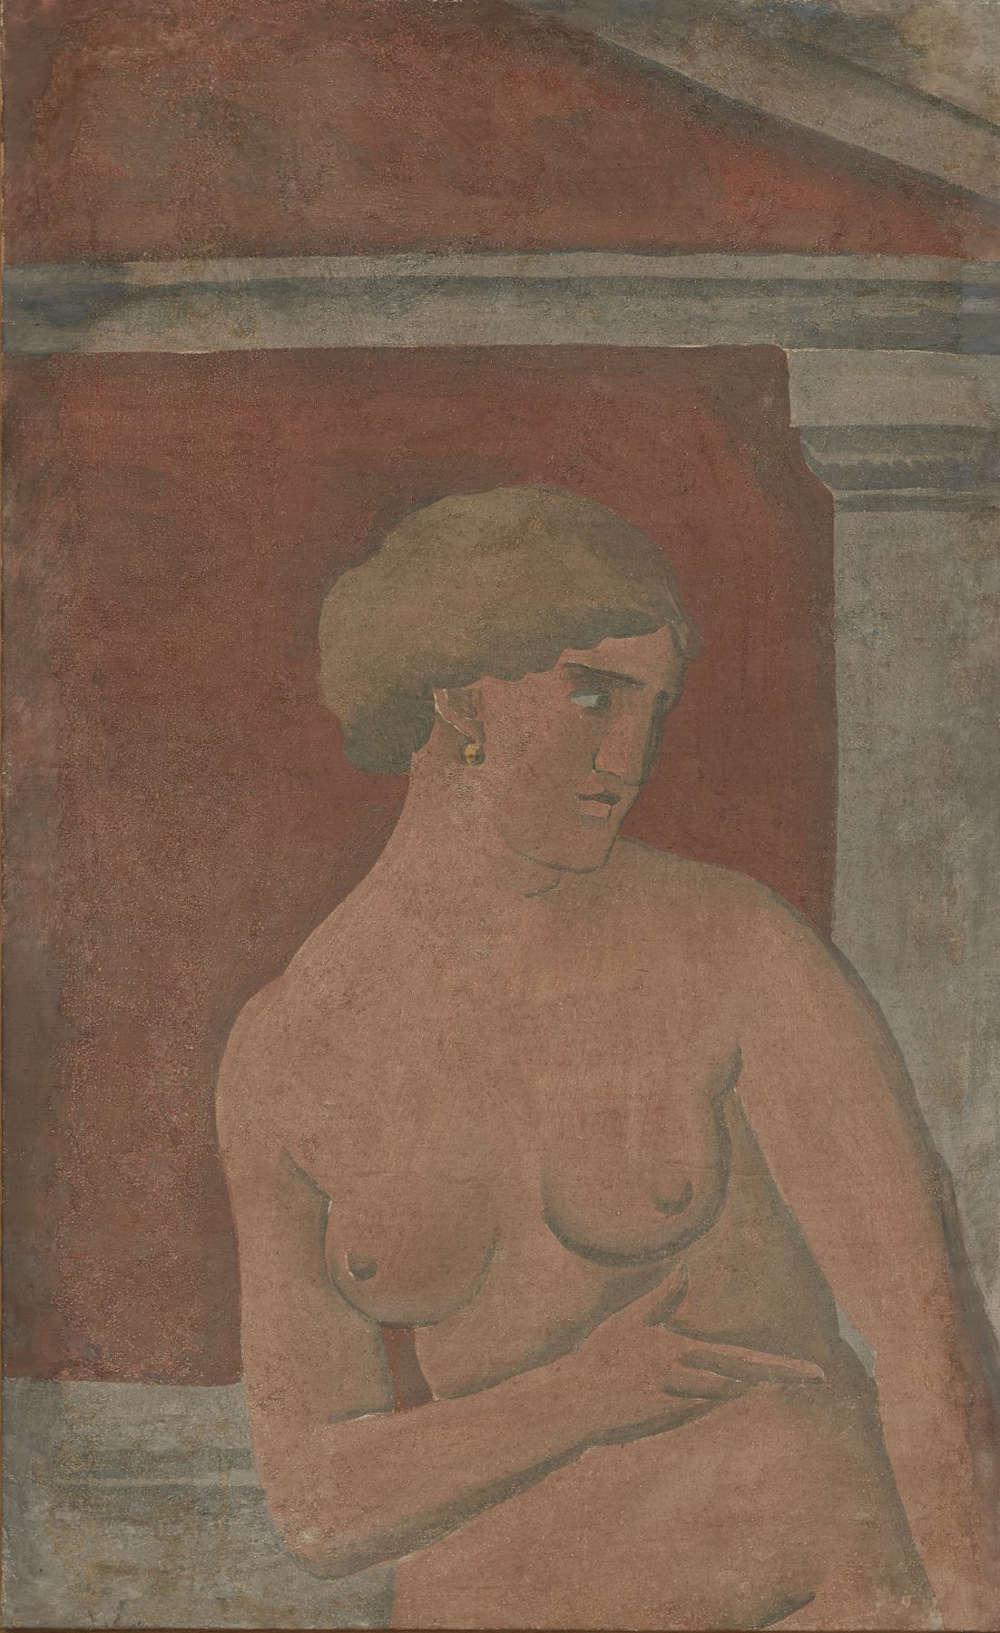 Joaquín Torres-García, Desnudo de mujer con frontón [Nude Woman with Pediment], 1926. Tempera on canvas, 47 x 29 inches (119.4 x 73.7 cm)